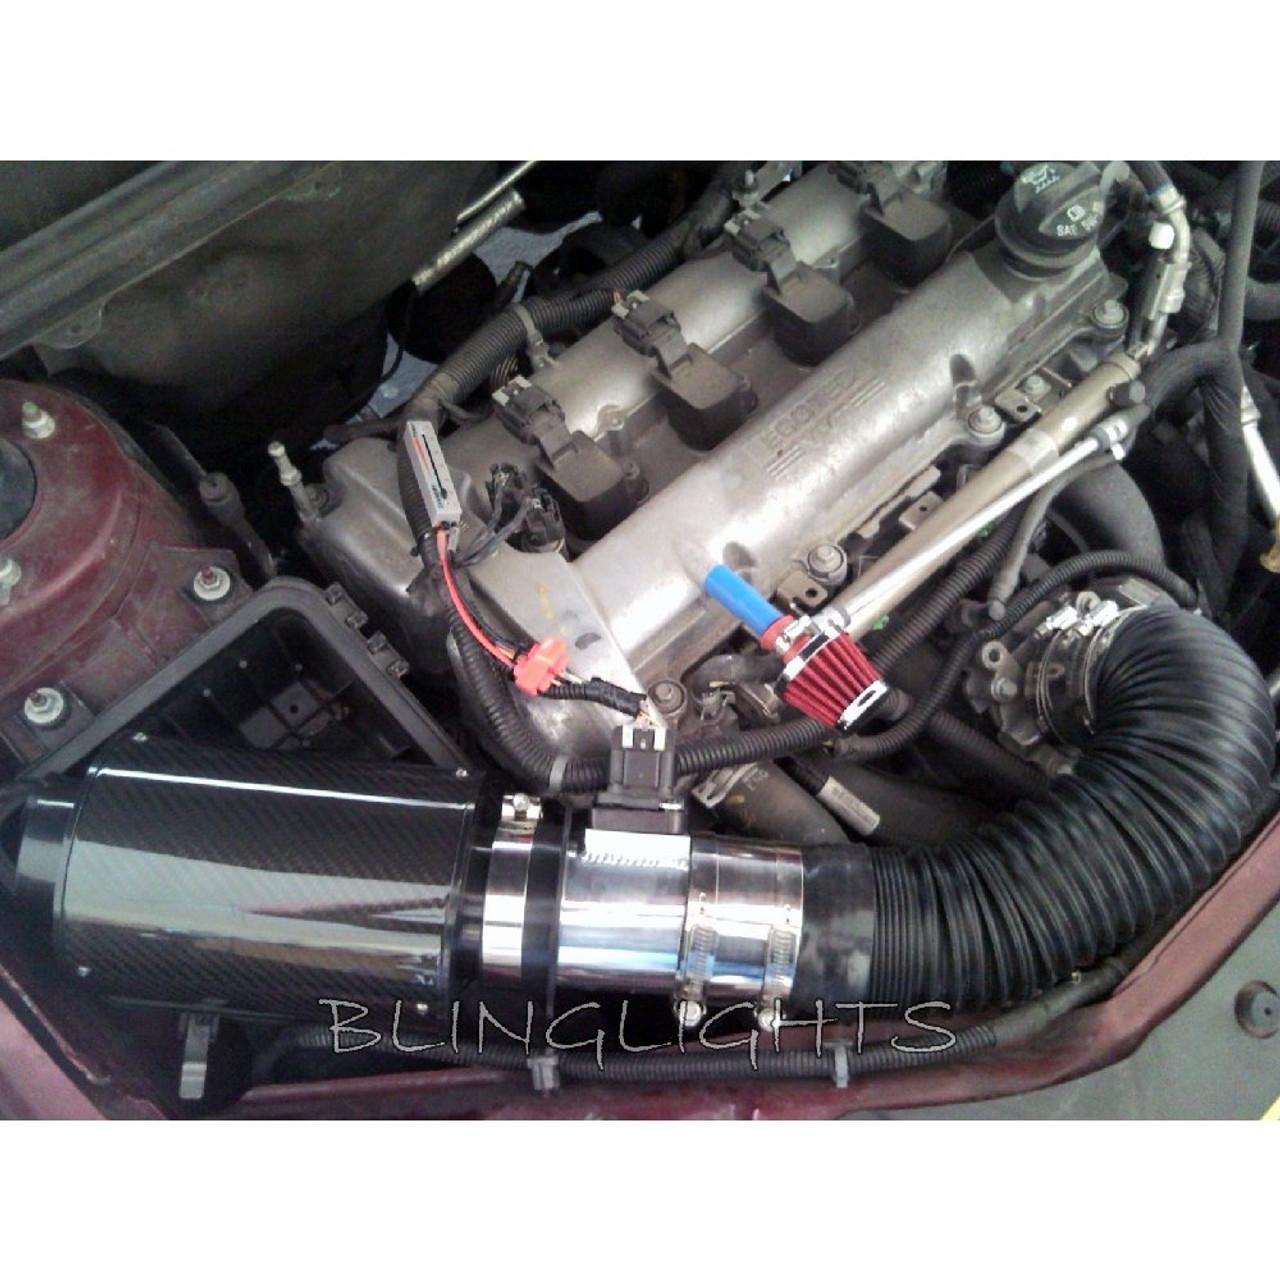 2006 2007 2008 2009 2010 2011 Chevrolet Chevy Hhr 2 2 L 2 2l Cai